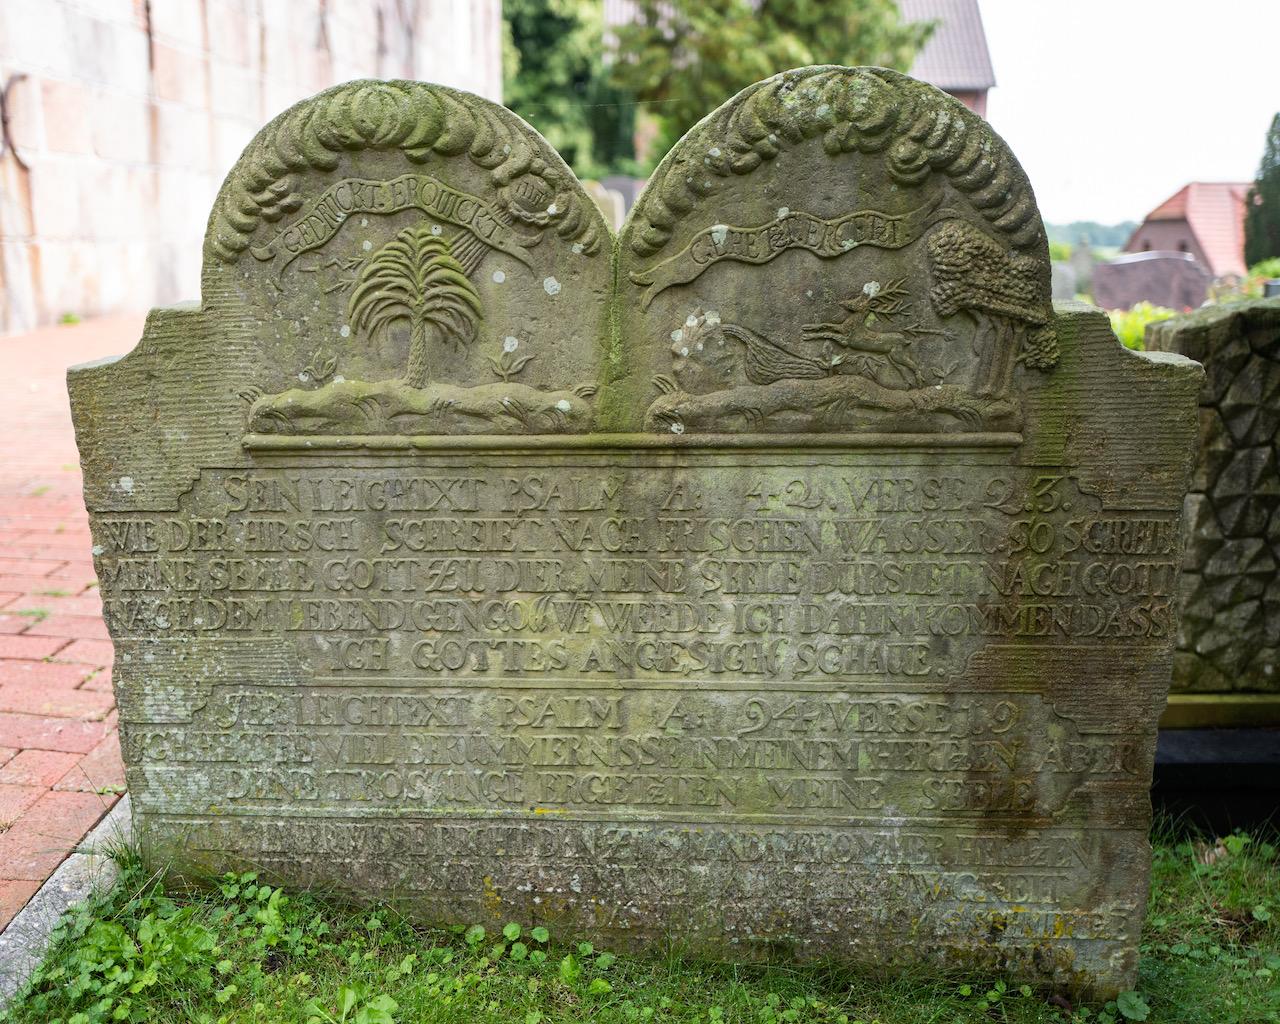 Grabstein mit der Inschrift: Gedrückt. Erquickt - Gehetzt. Ergetzt